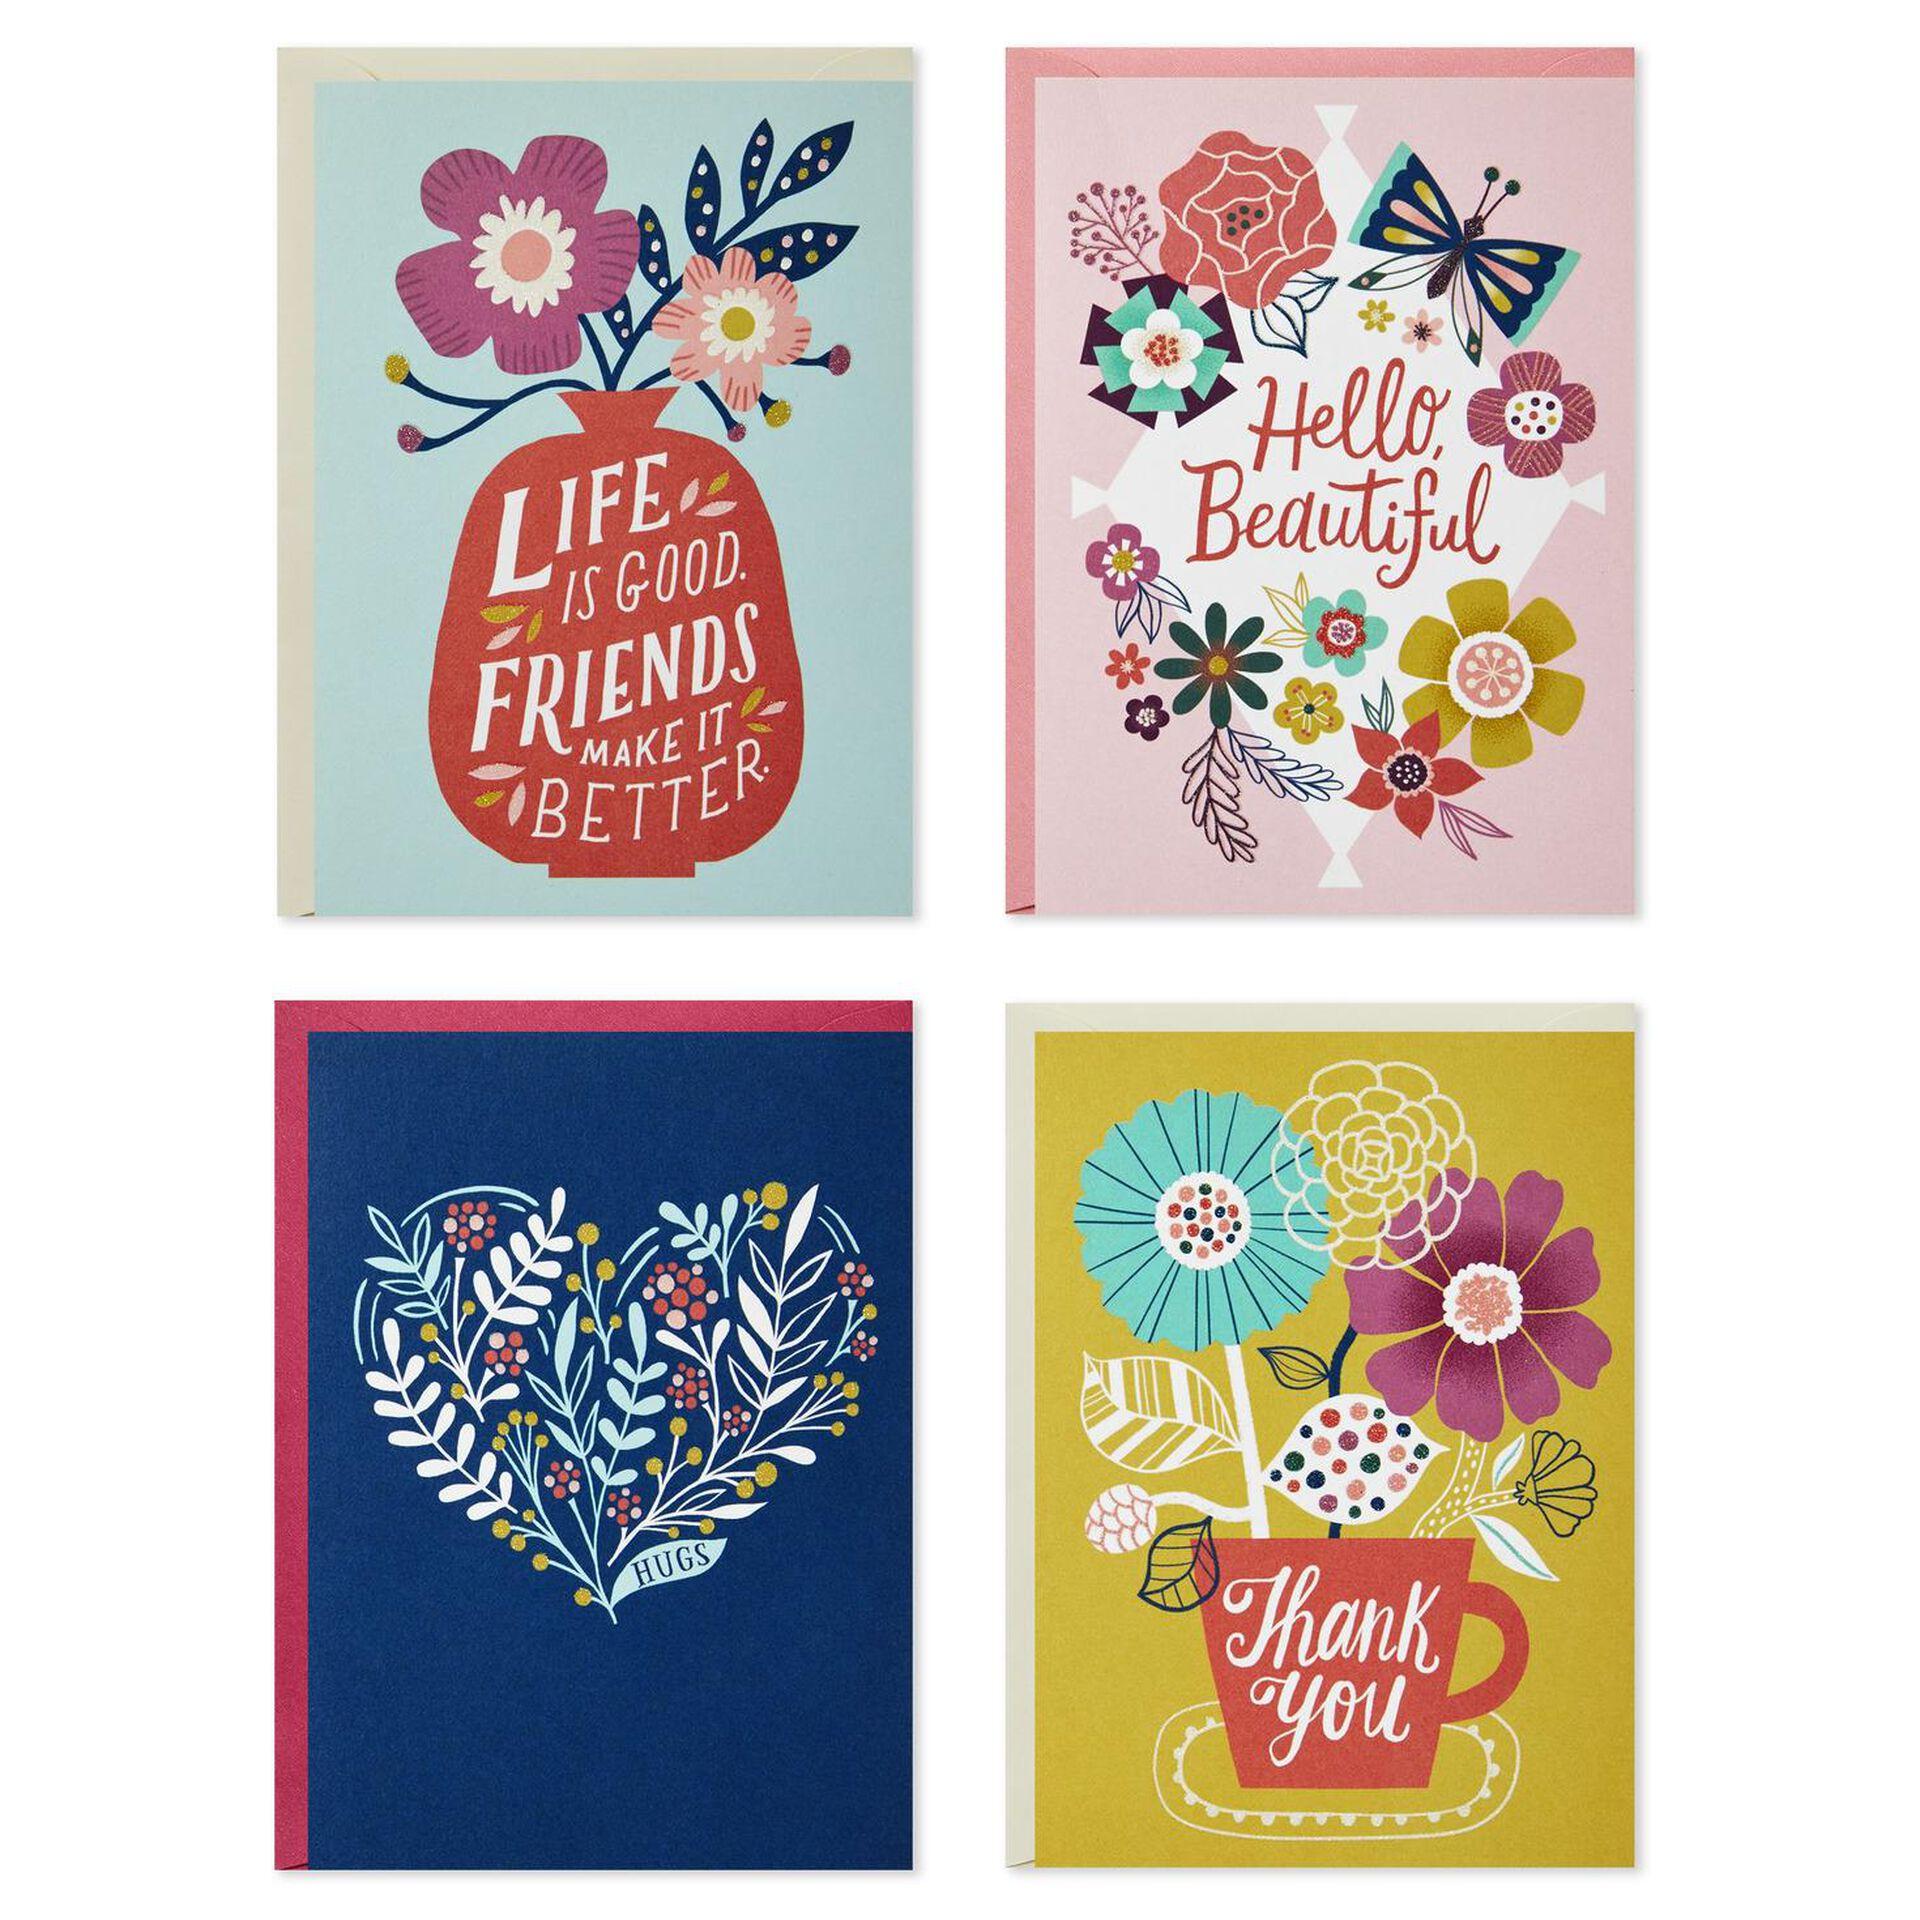 CafePress Matte Pack of 20 Pk Of 20 - Blank Note Cards Celebrate Nurses Note Cards